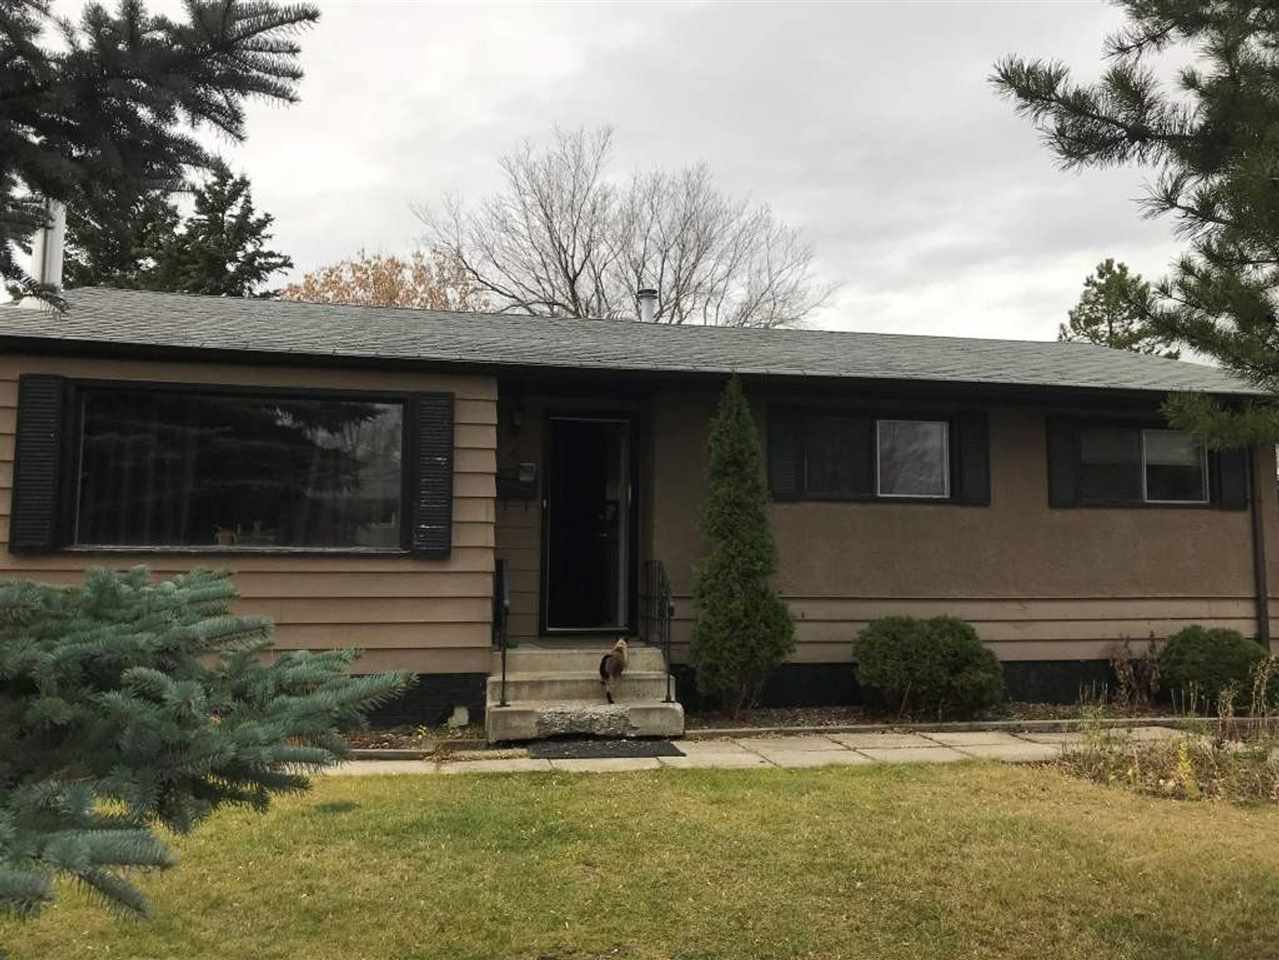 Main Photo: 4 EAGLE Drive: Sherwood Park House for sale : MLS®# E4223611